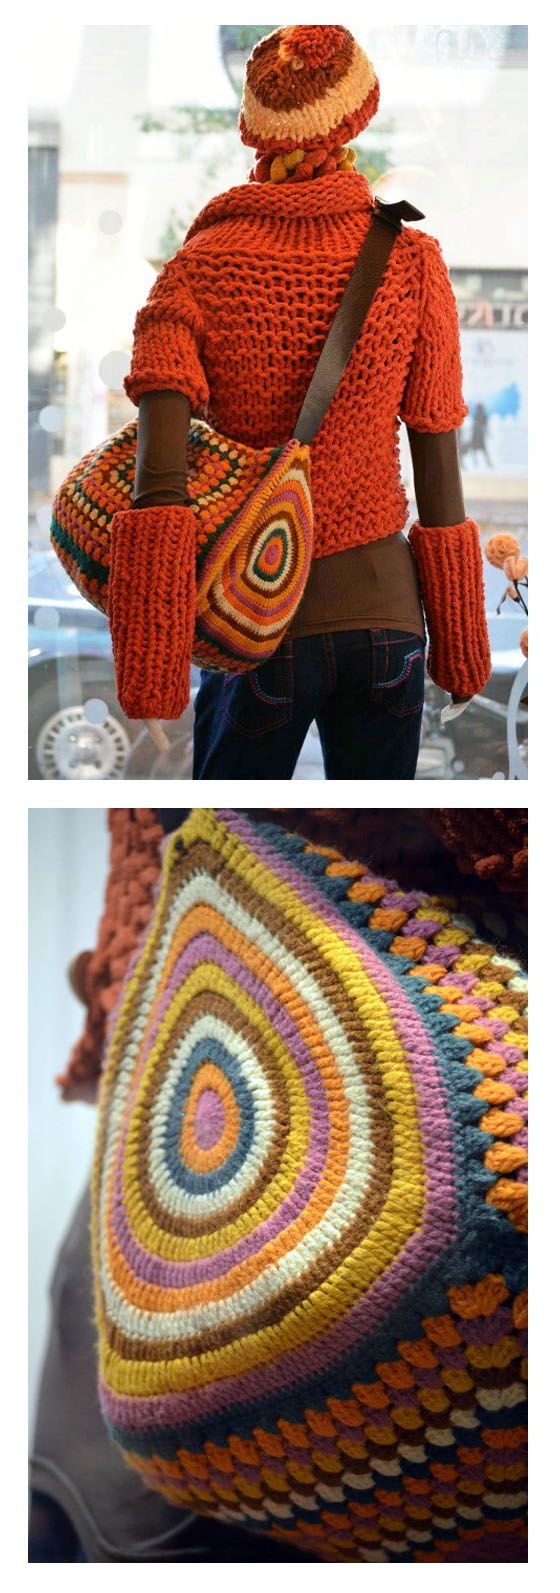 Crochet bag - idea - similar pattern: http://www.liveinternet.ru/users/tatmel/post287931121/